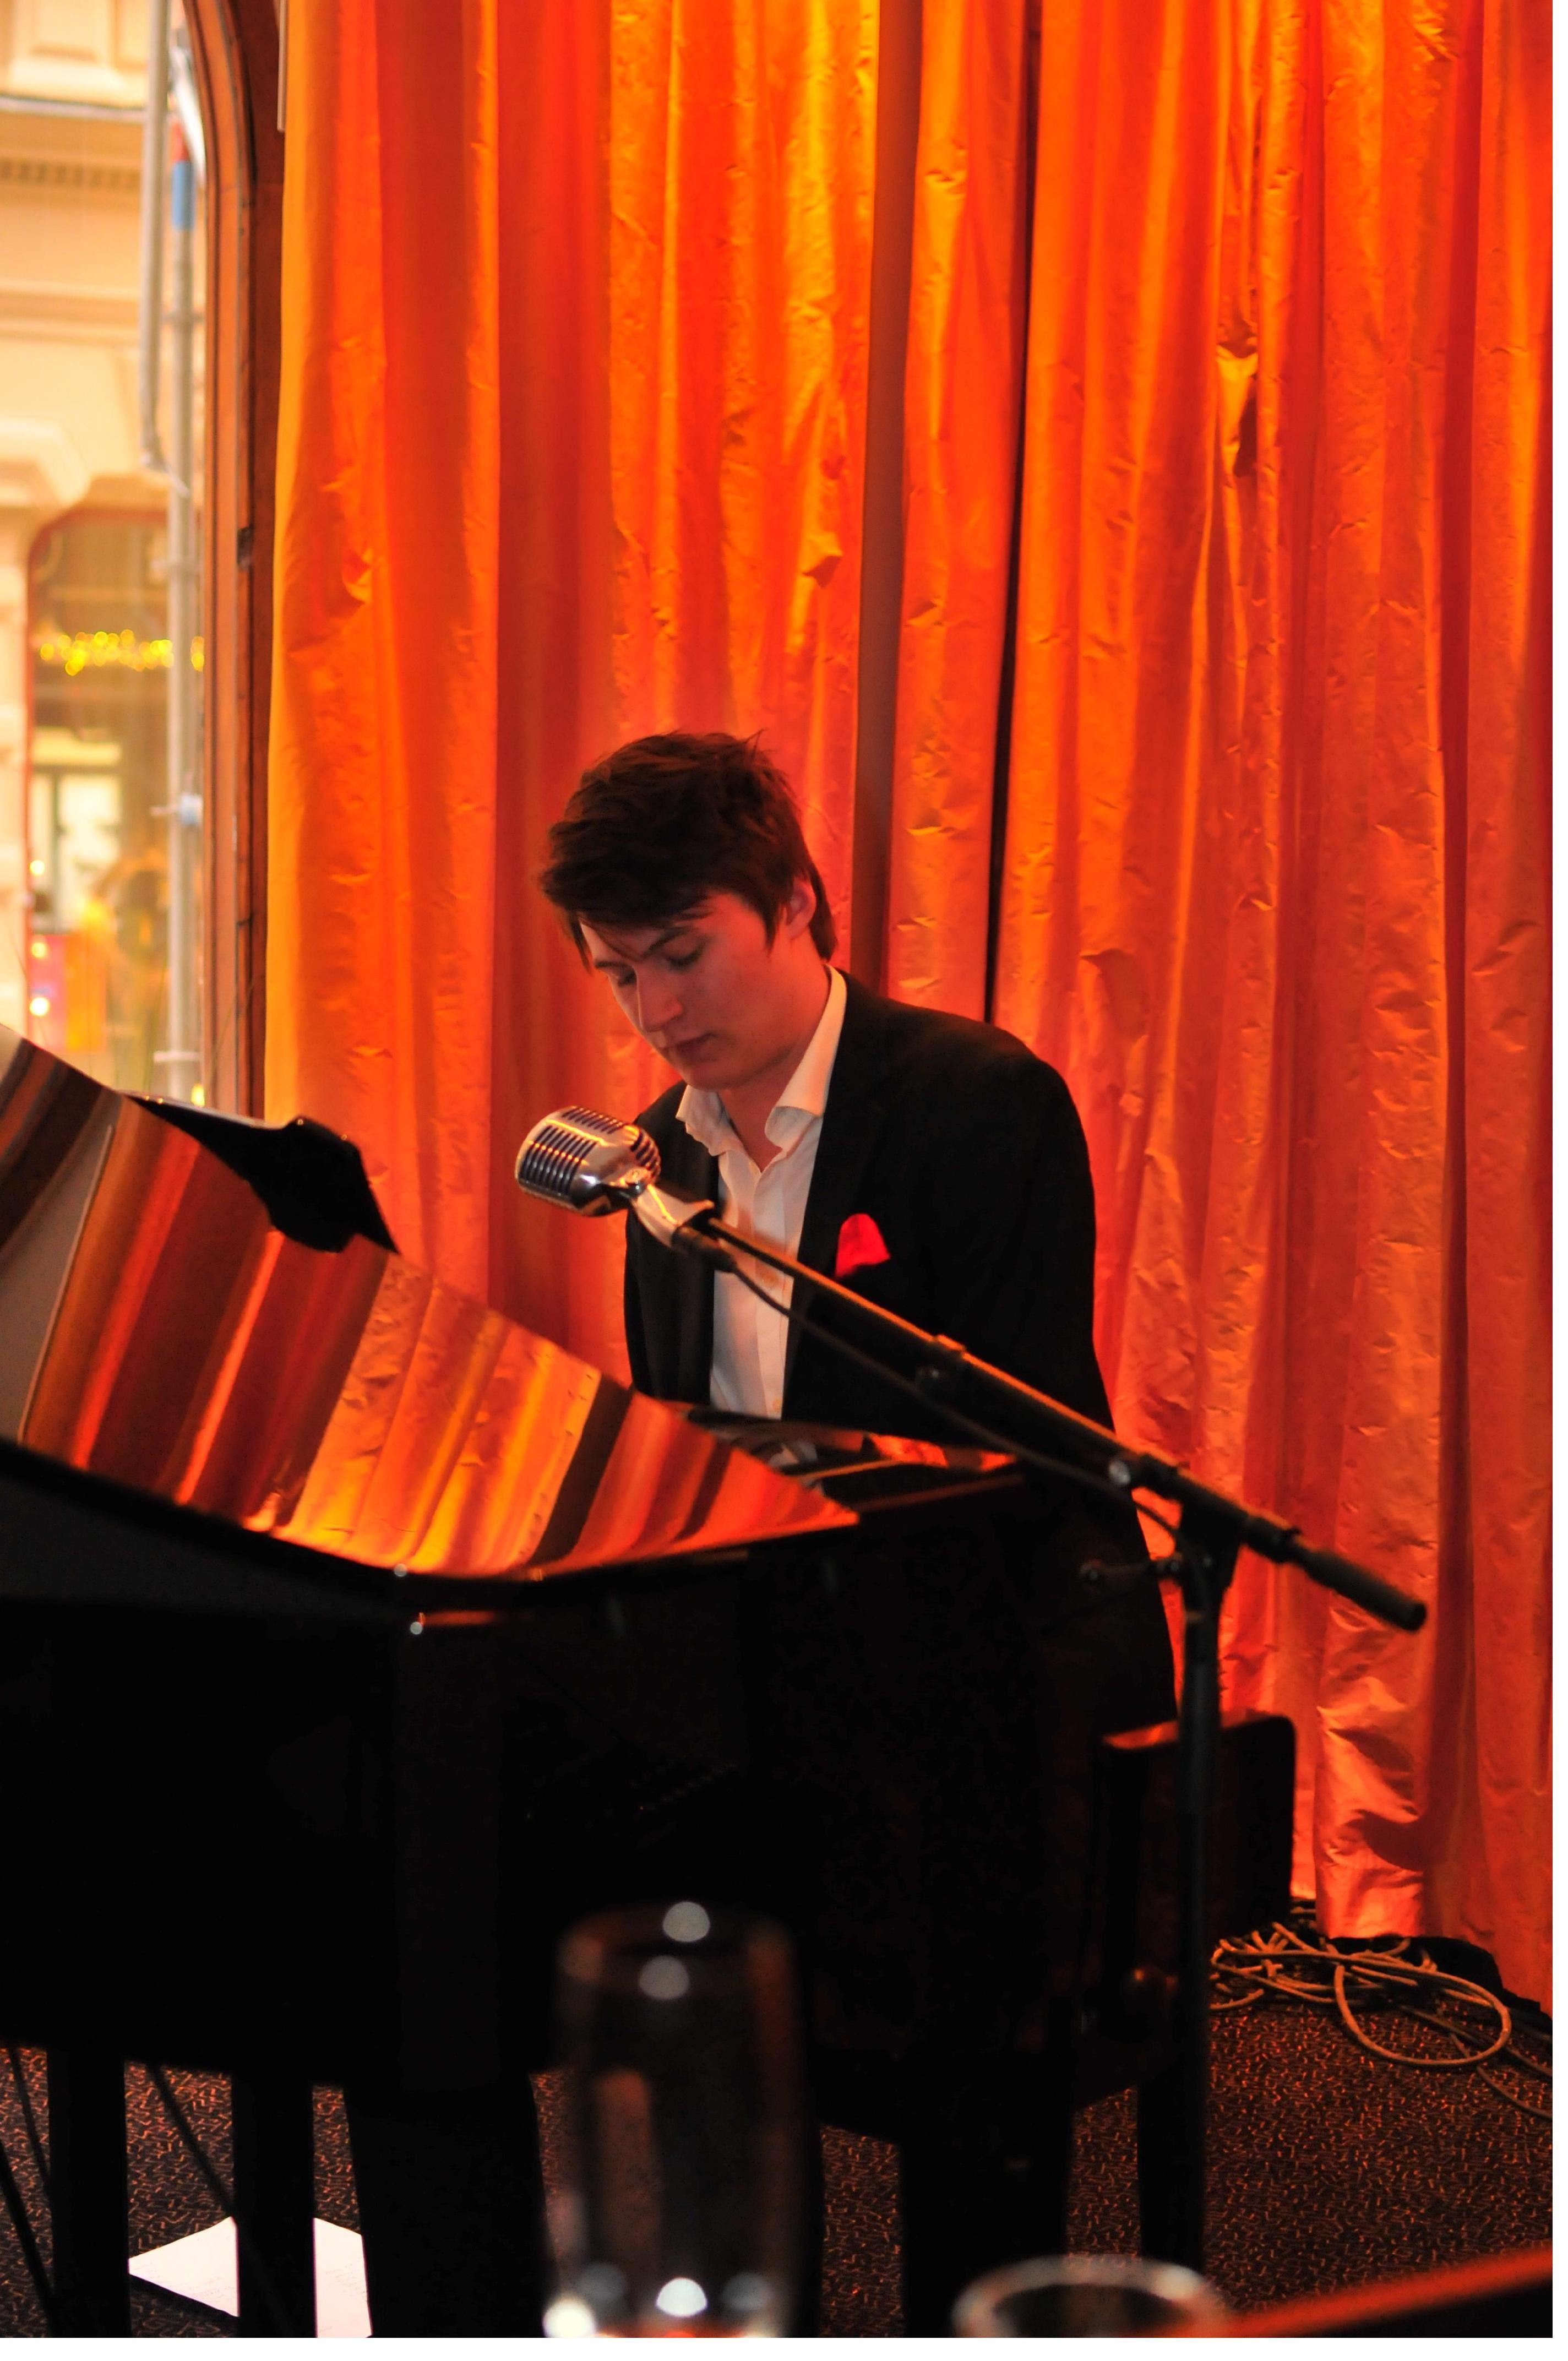 Opus Restaurang & Pianobar